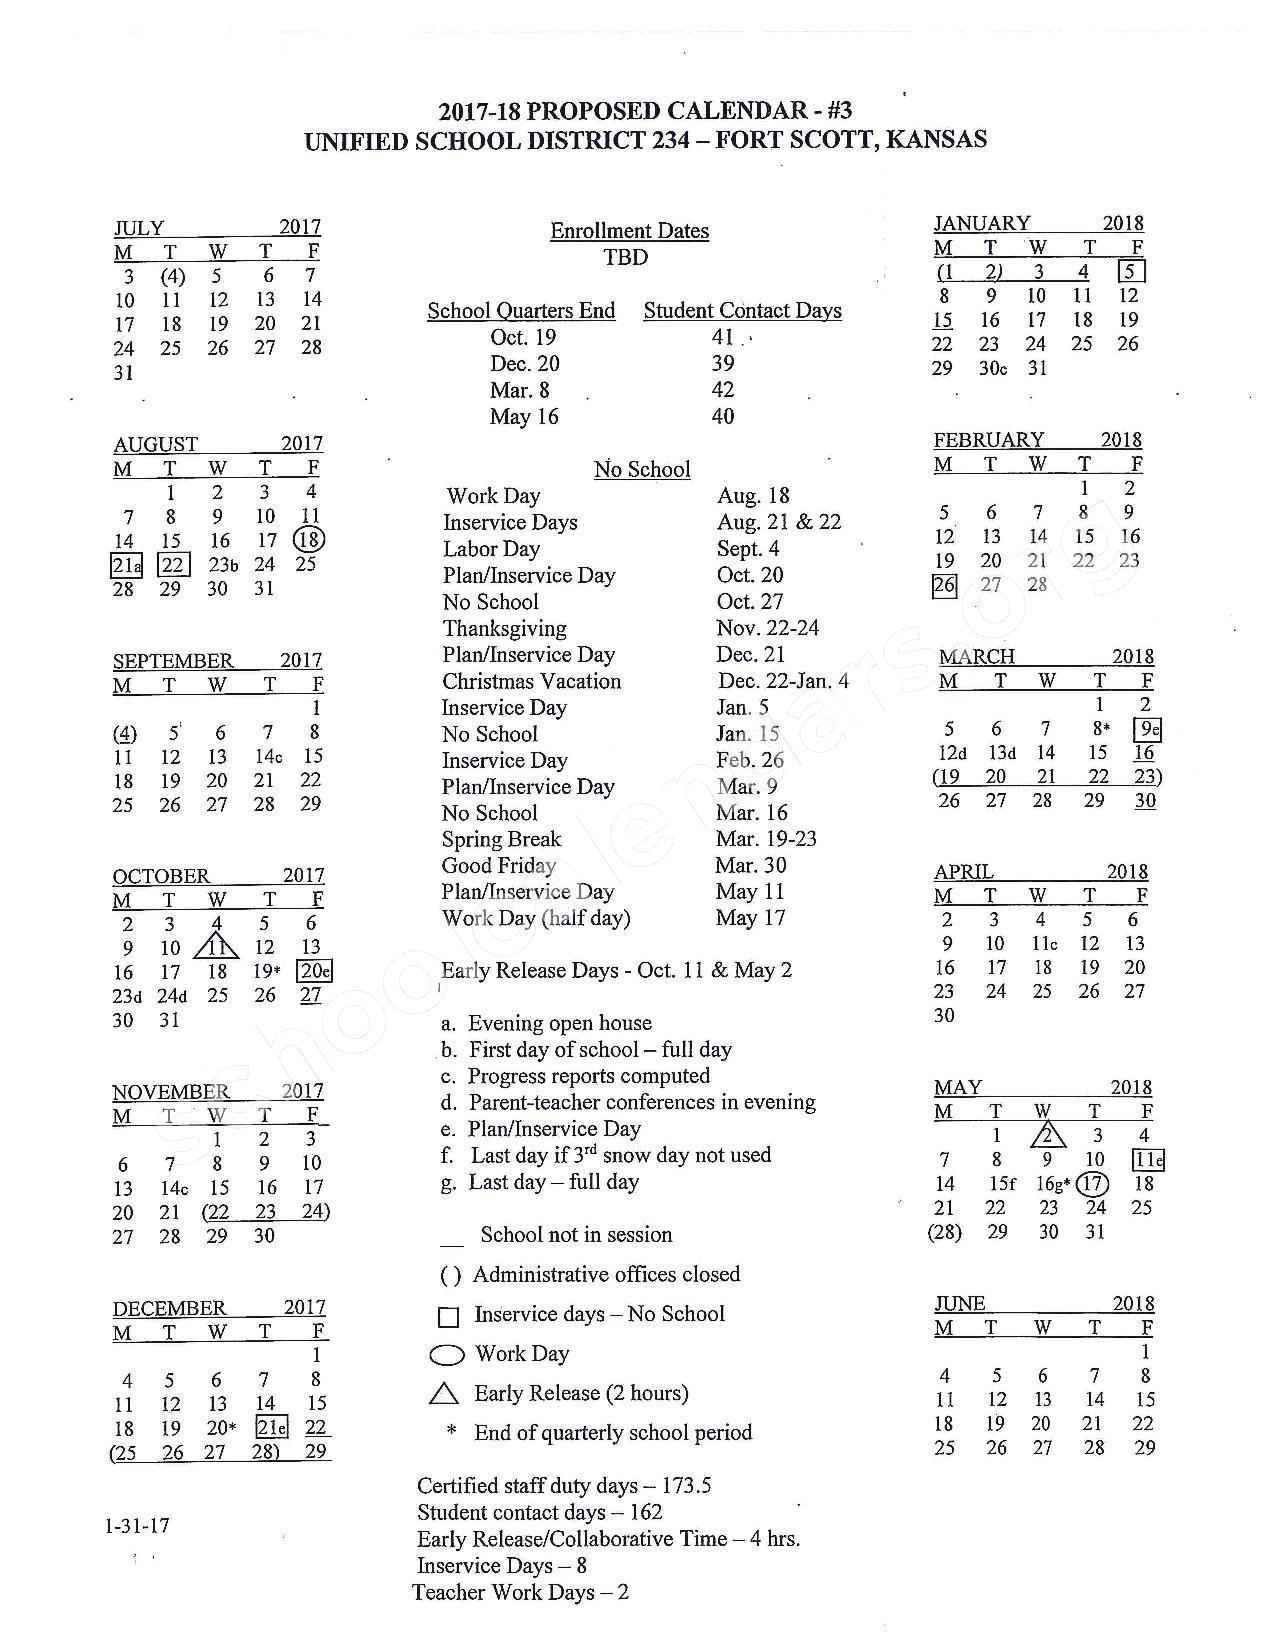 2017 - 2018 School Calendar – Fort Scott Unified School District 234 – page 1